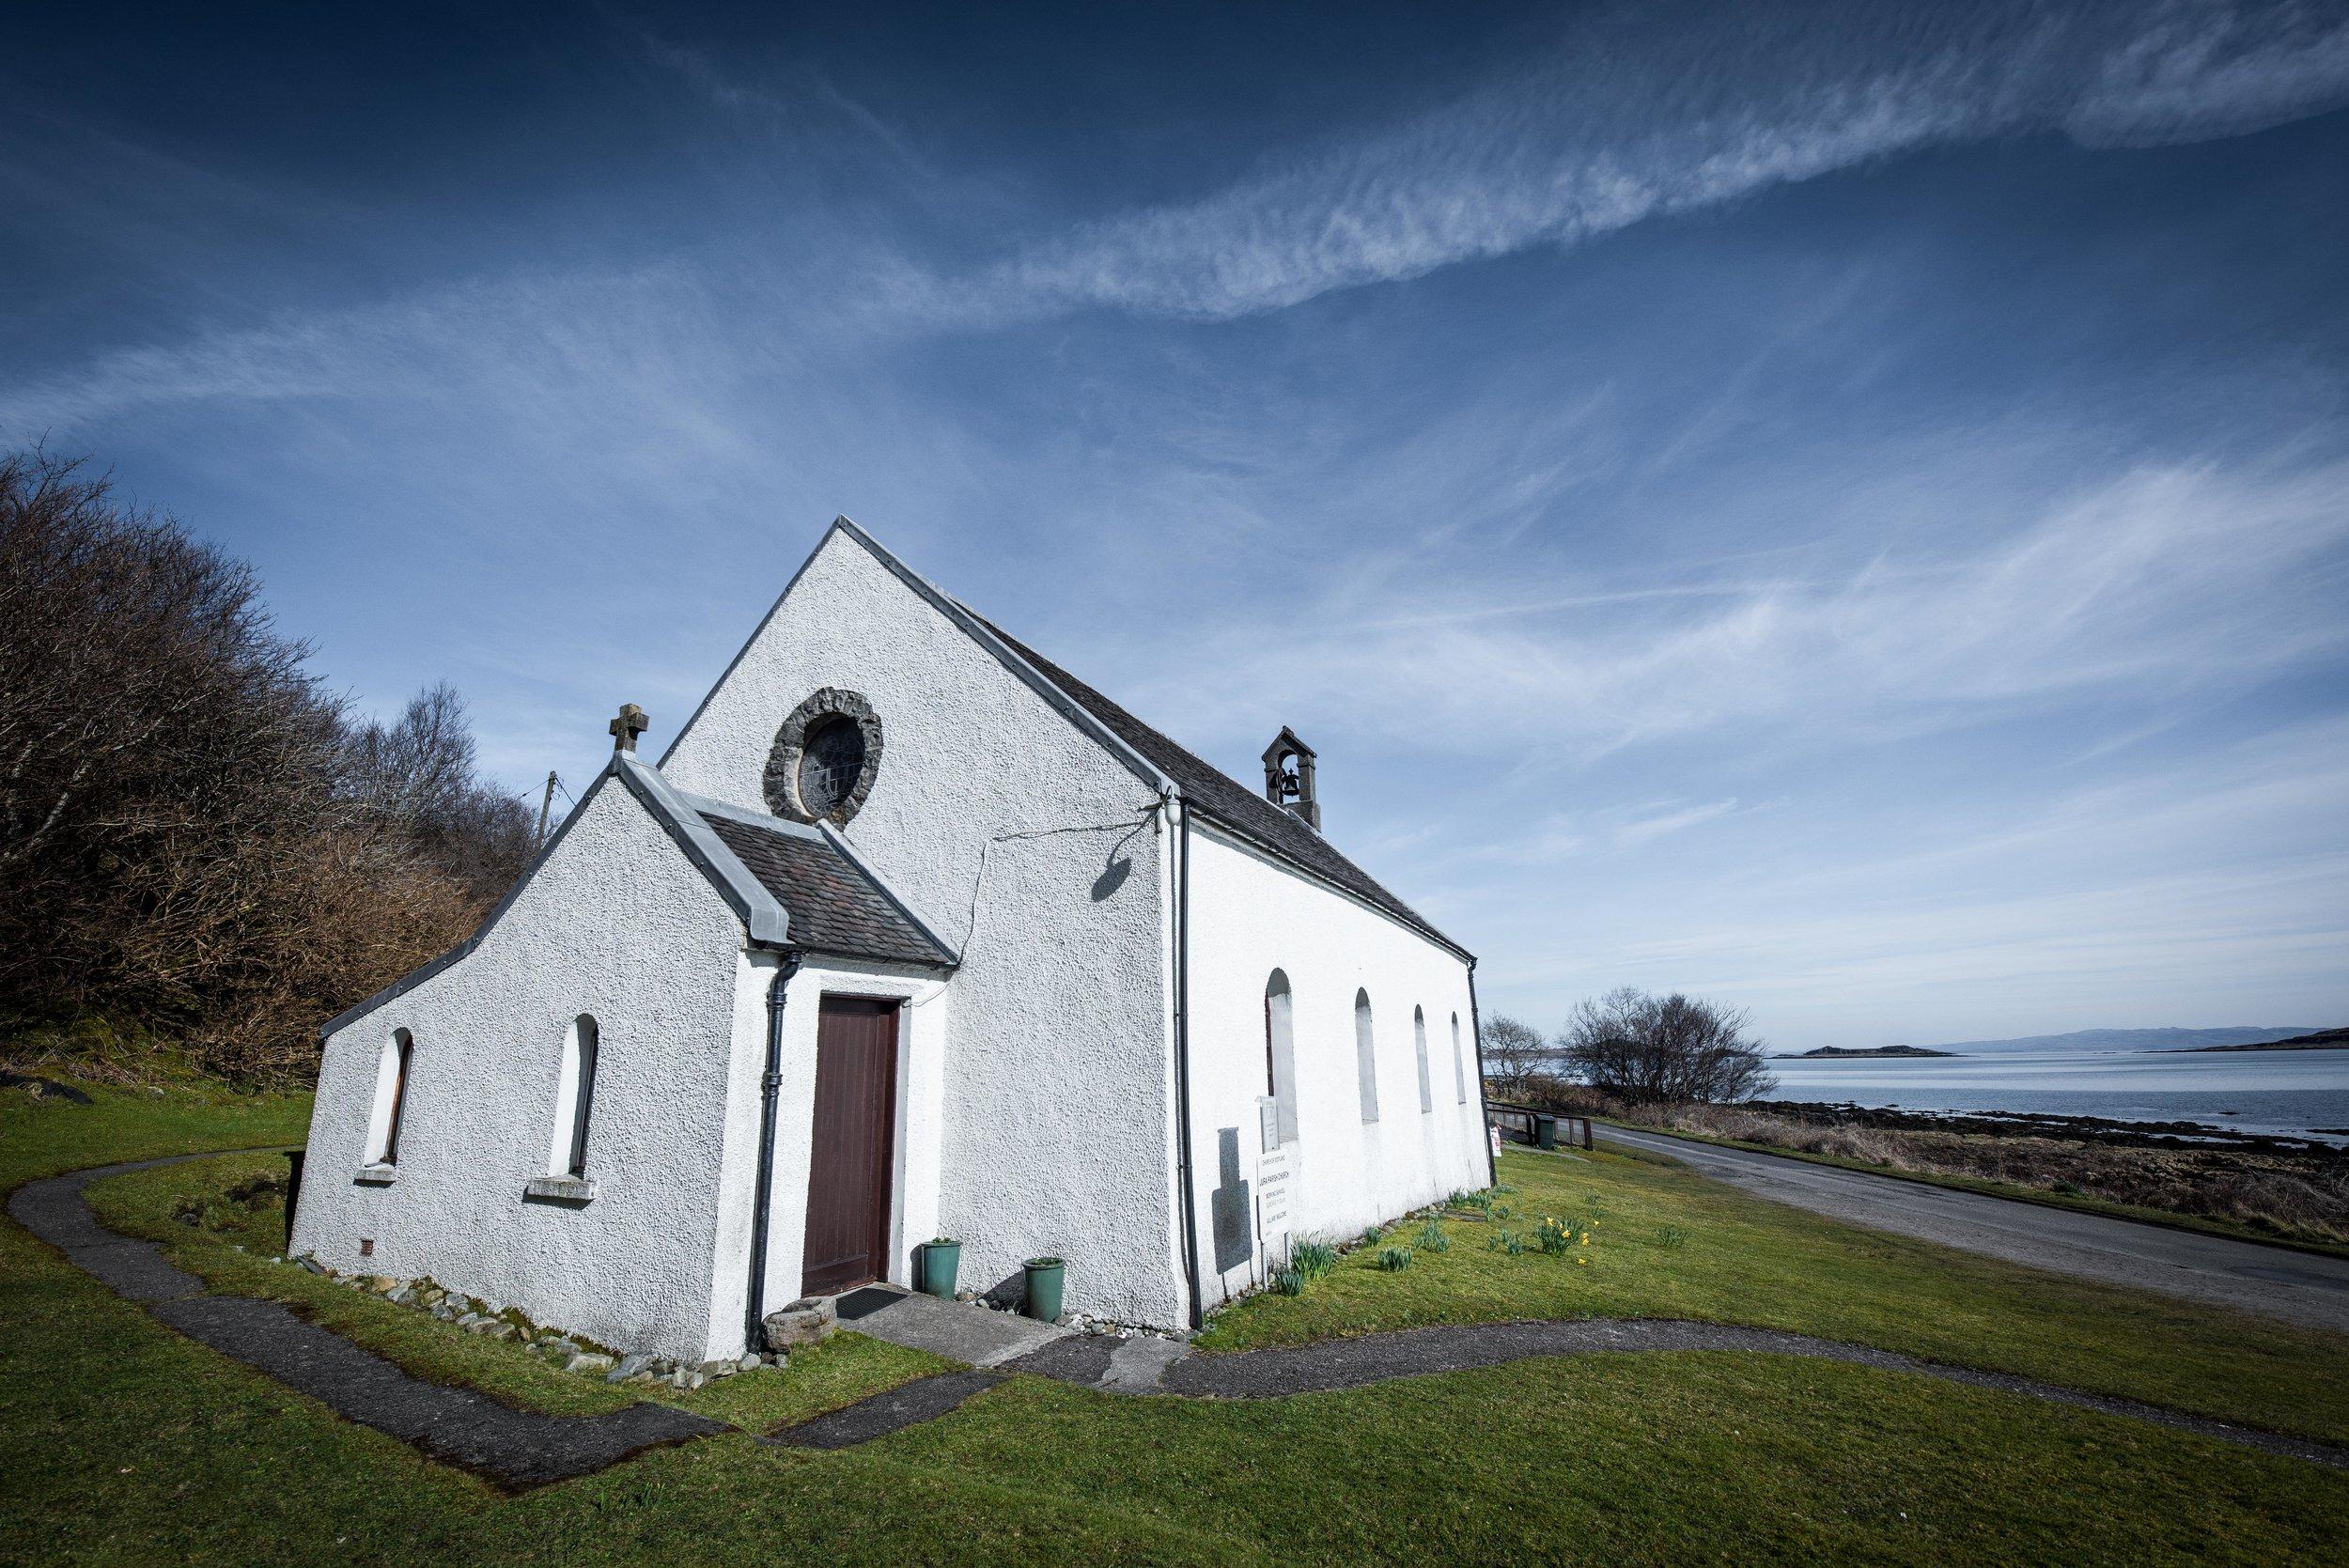 5. Local of Tjørnuvík, Isle of Streymoy